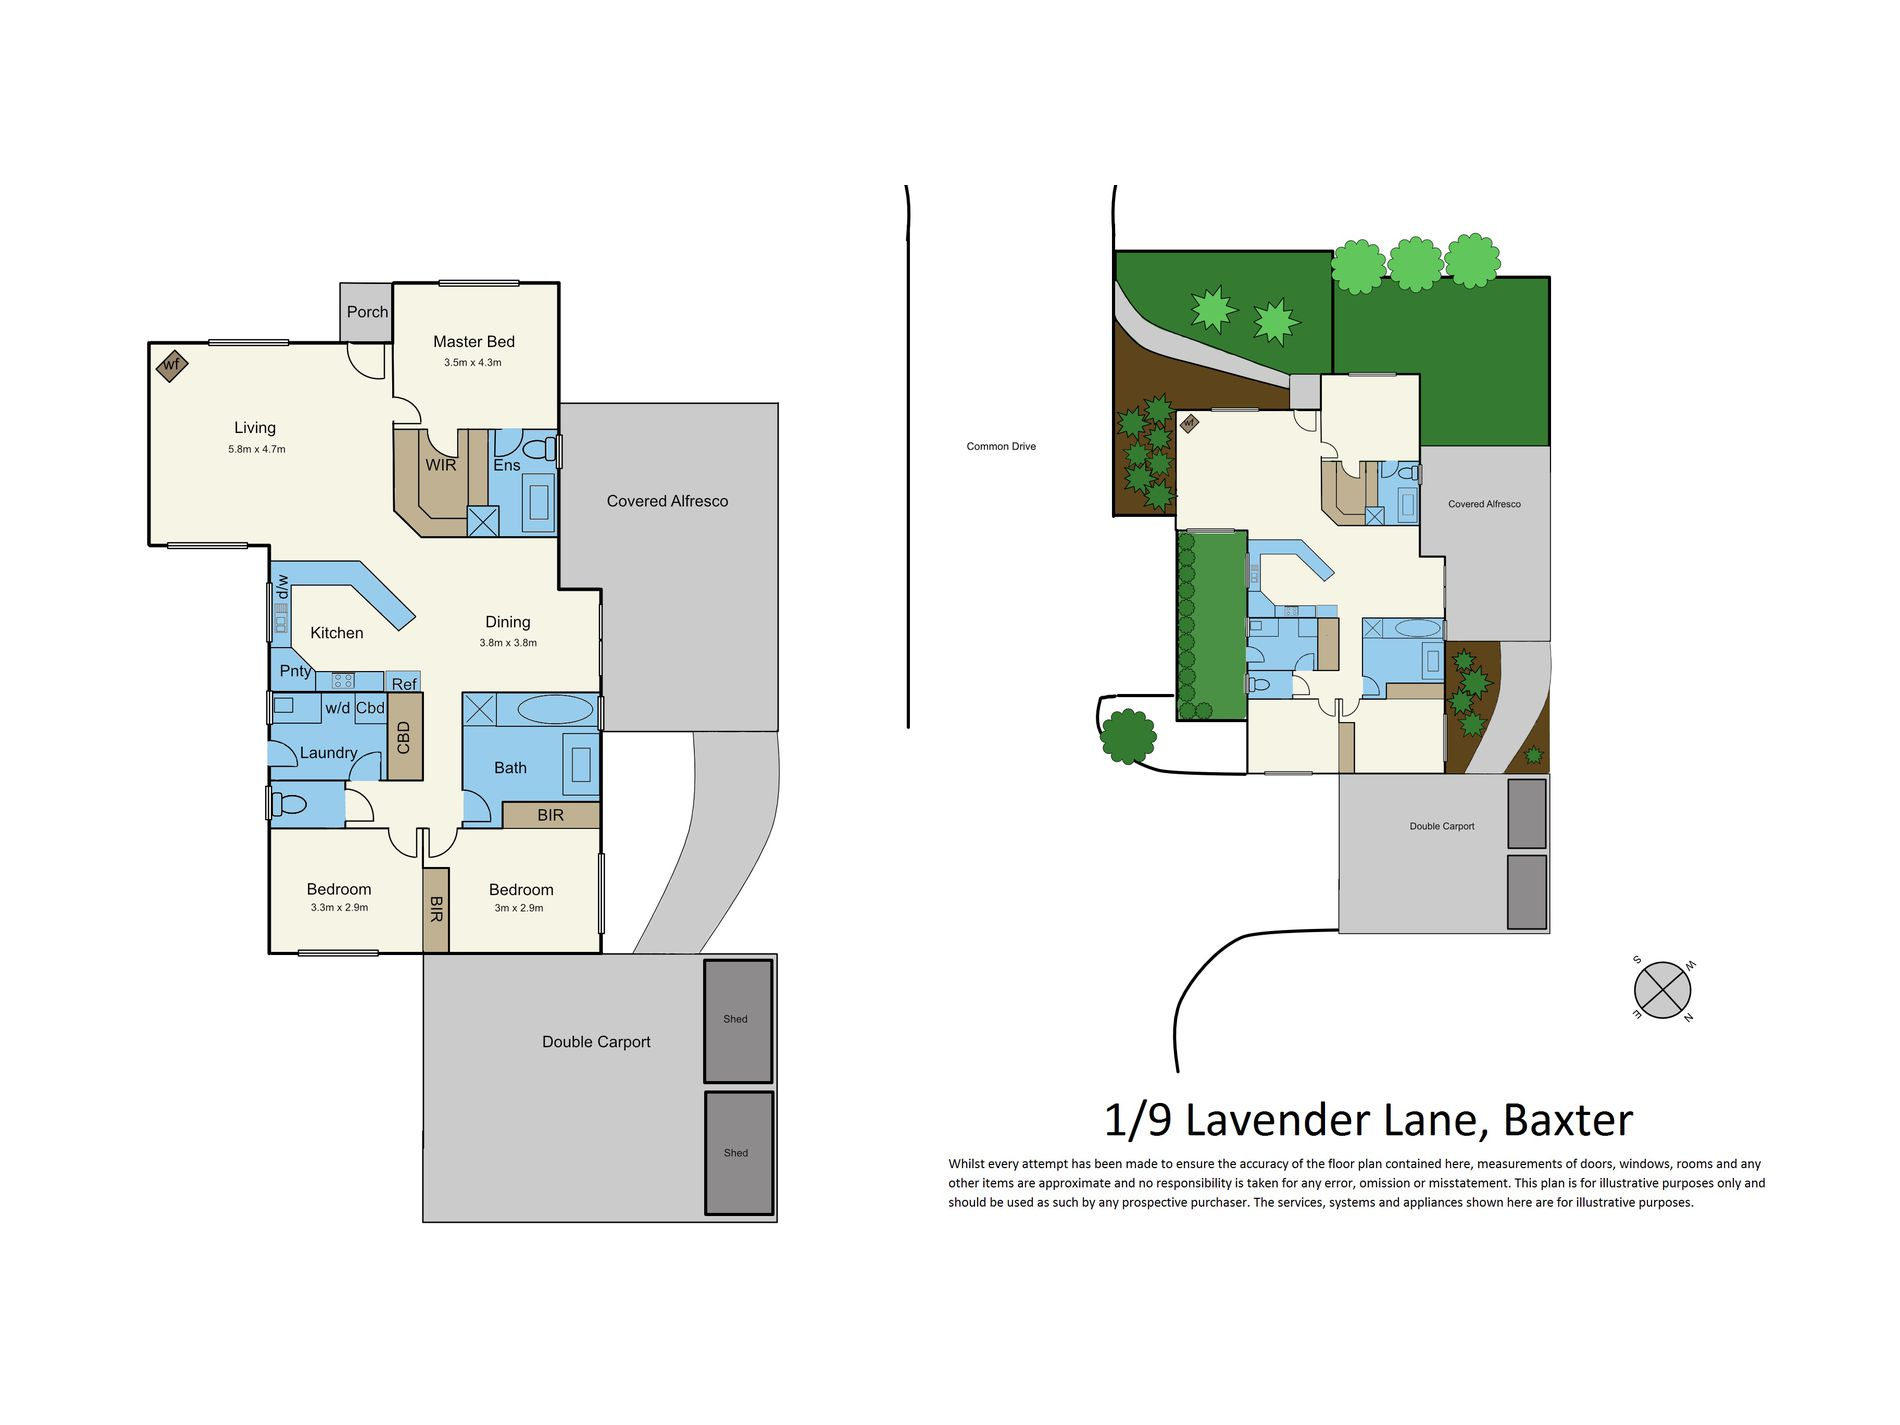 1 / 9 Lavender Lane, Baxter